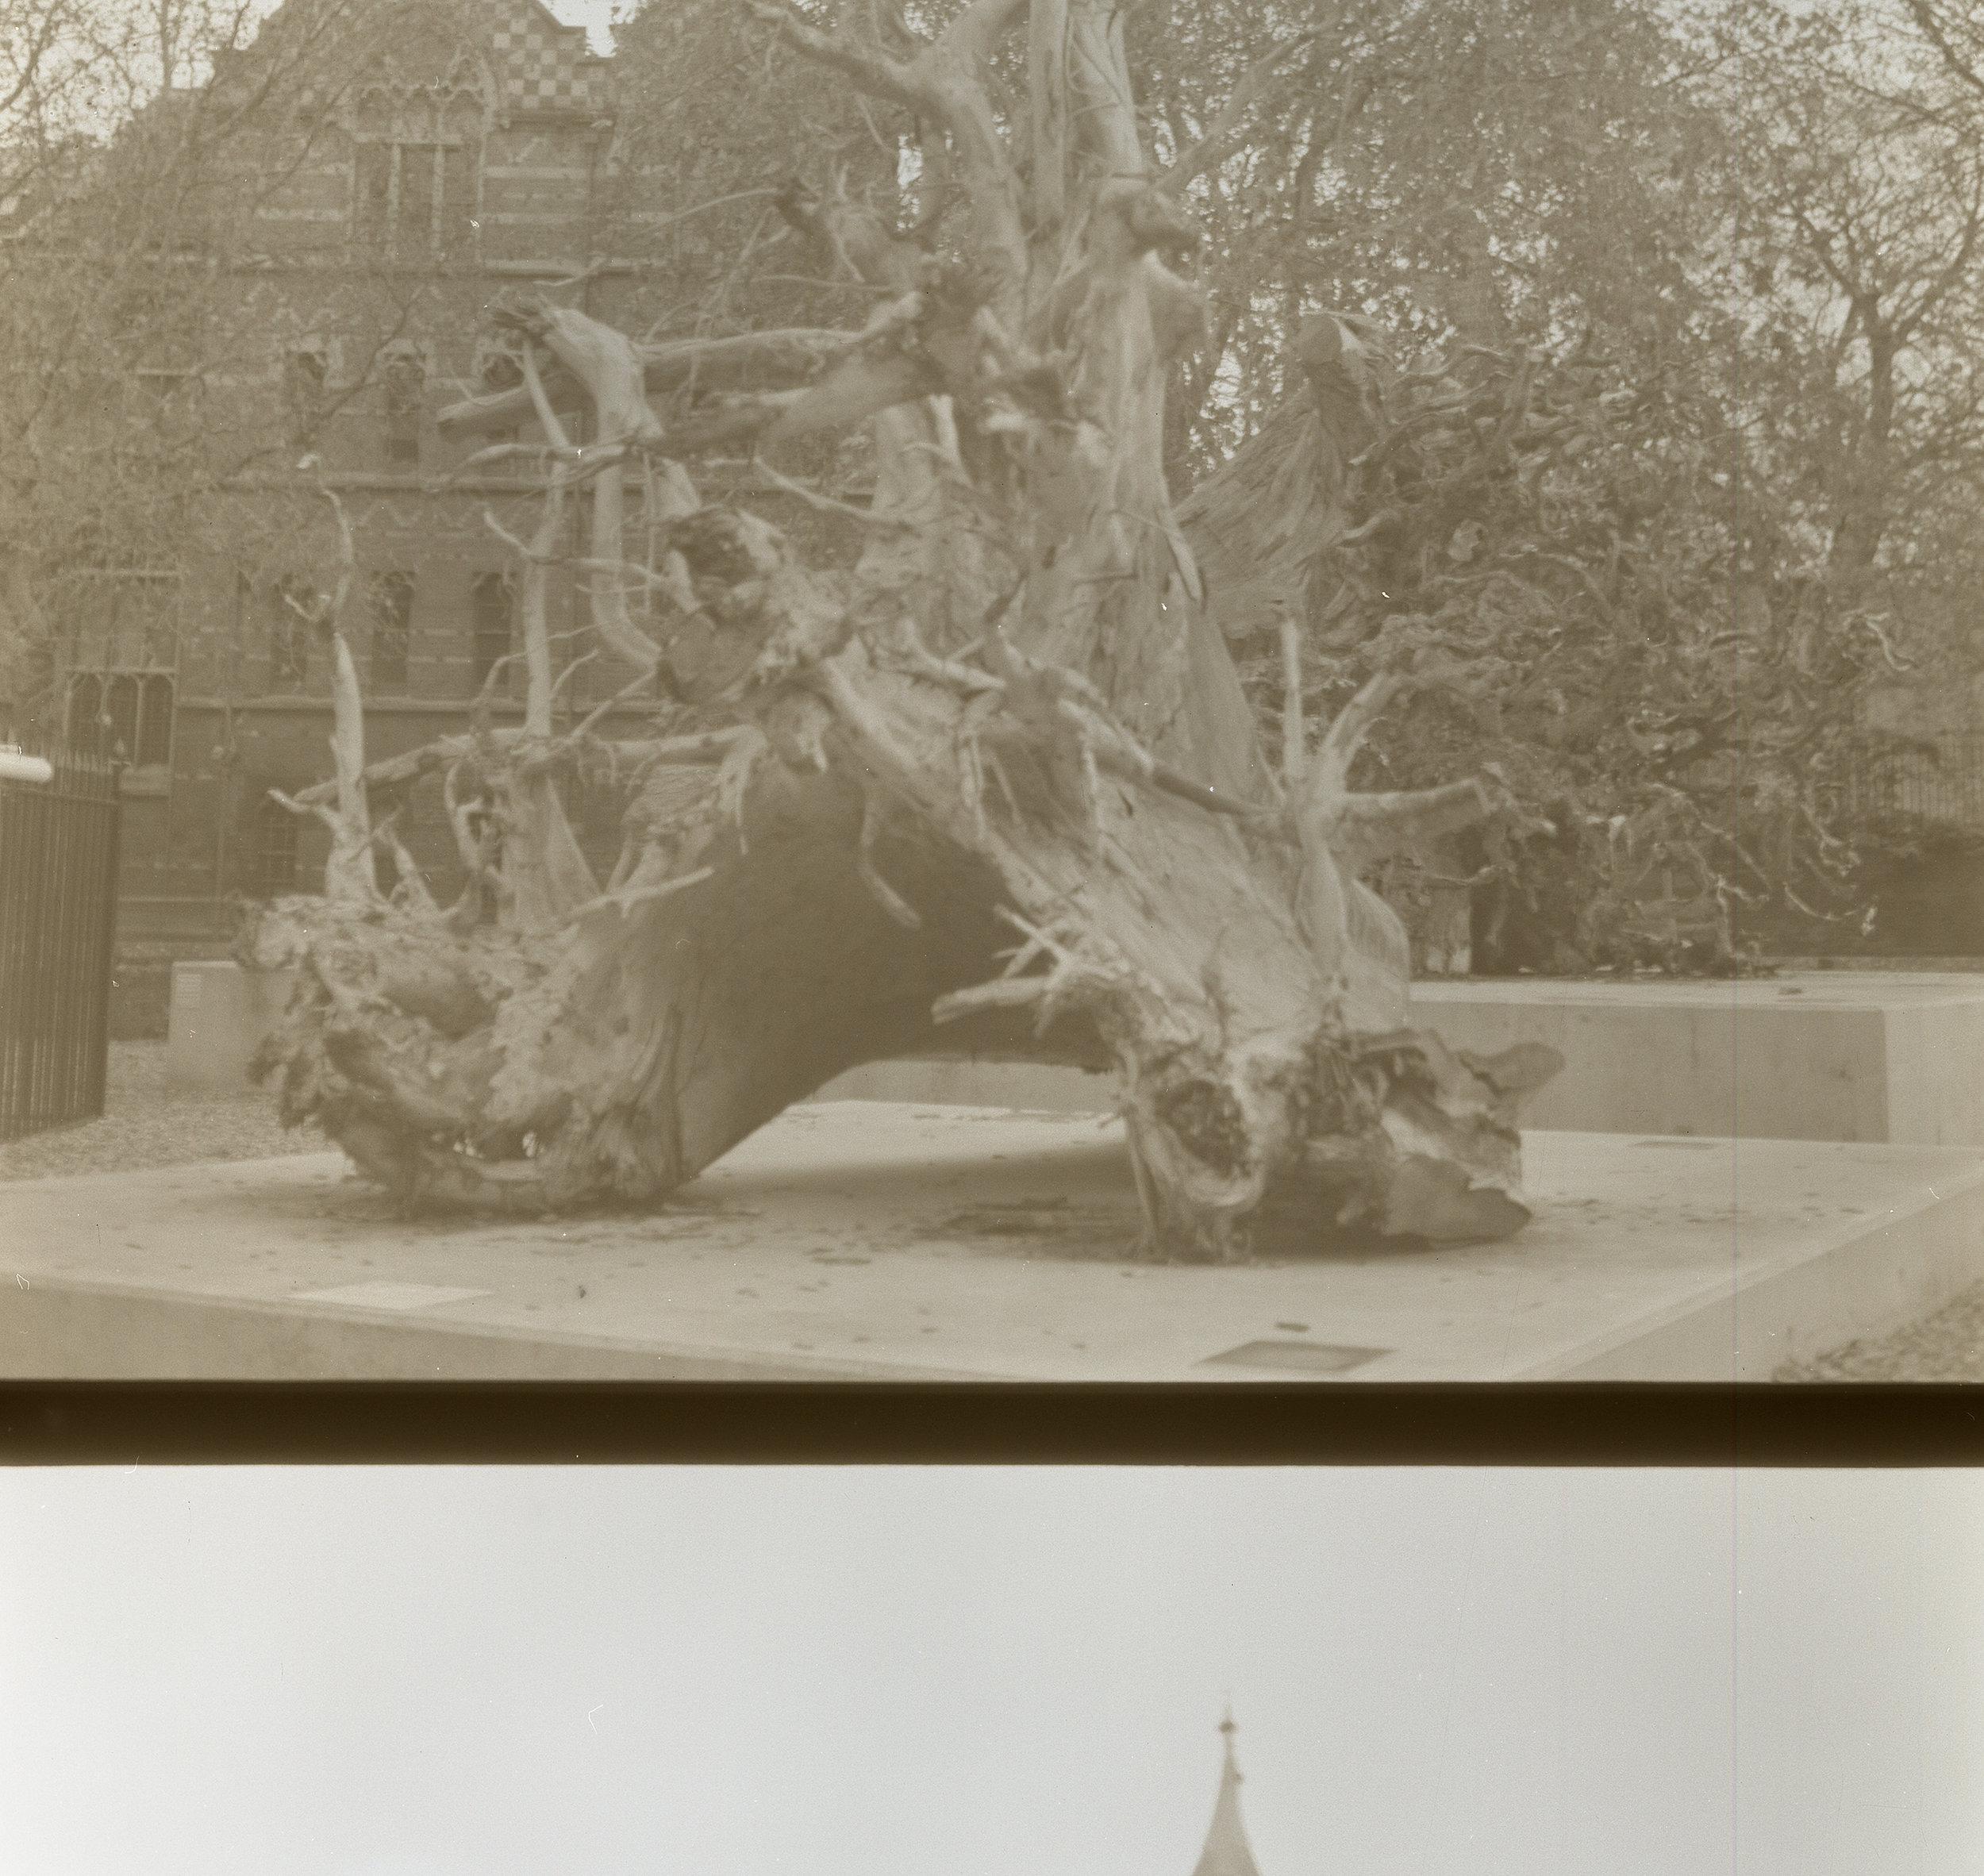 Camera: Yashica Mat-124G  Film: Lomography B&W 100  Location: Oxford, England